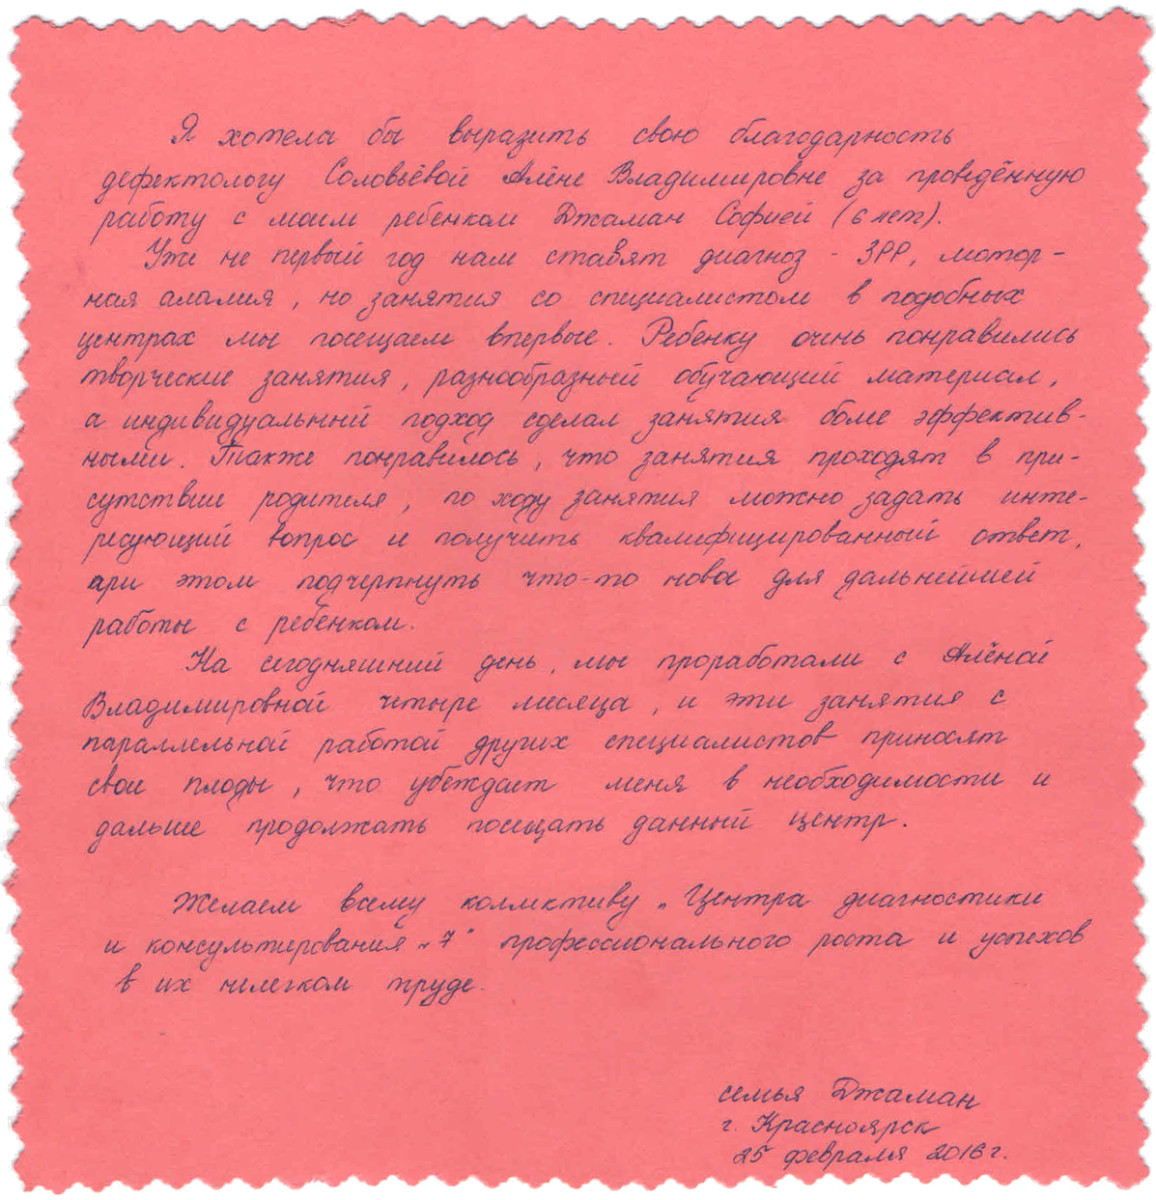 Blagodarnost-Soloveva-A.V